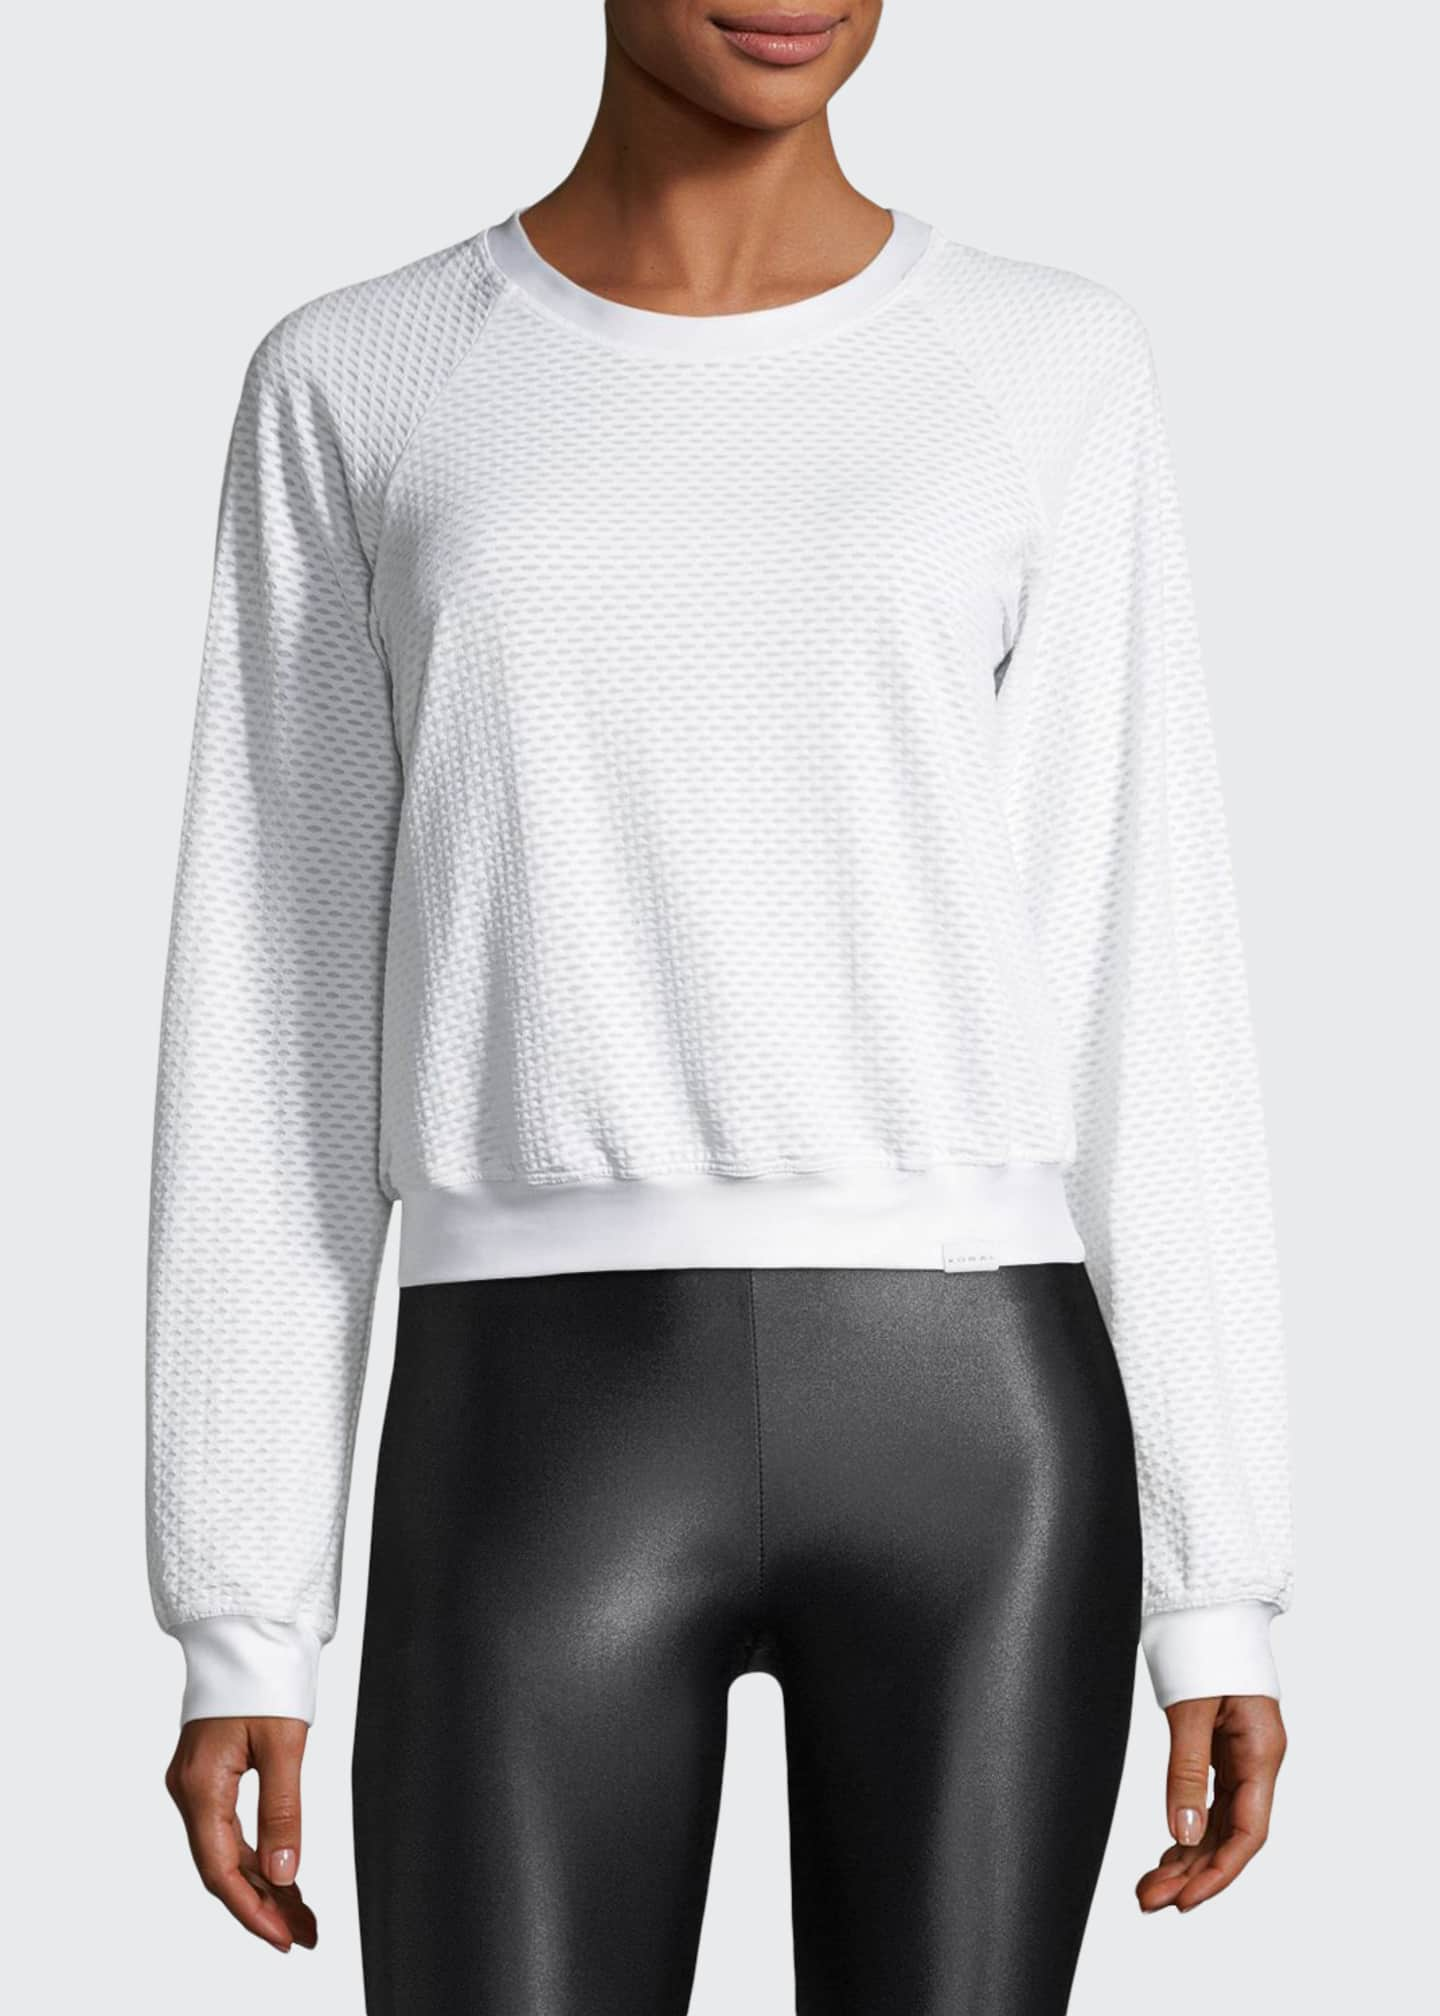 Koral Sofia Crewneck Long-Sleeve Pullover Top